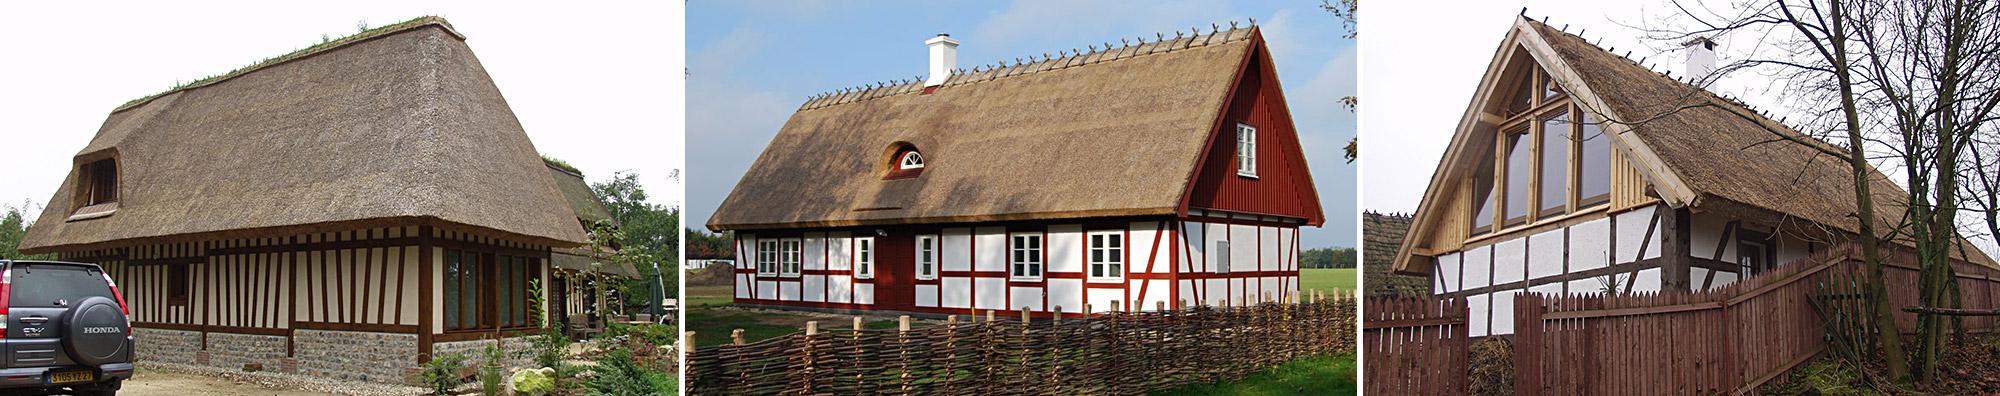 Holzhaus Polen Holzhaus Bauen Polen Fachwerk Holzrahmenbau De